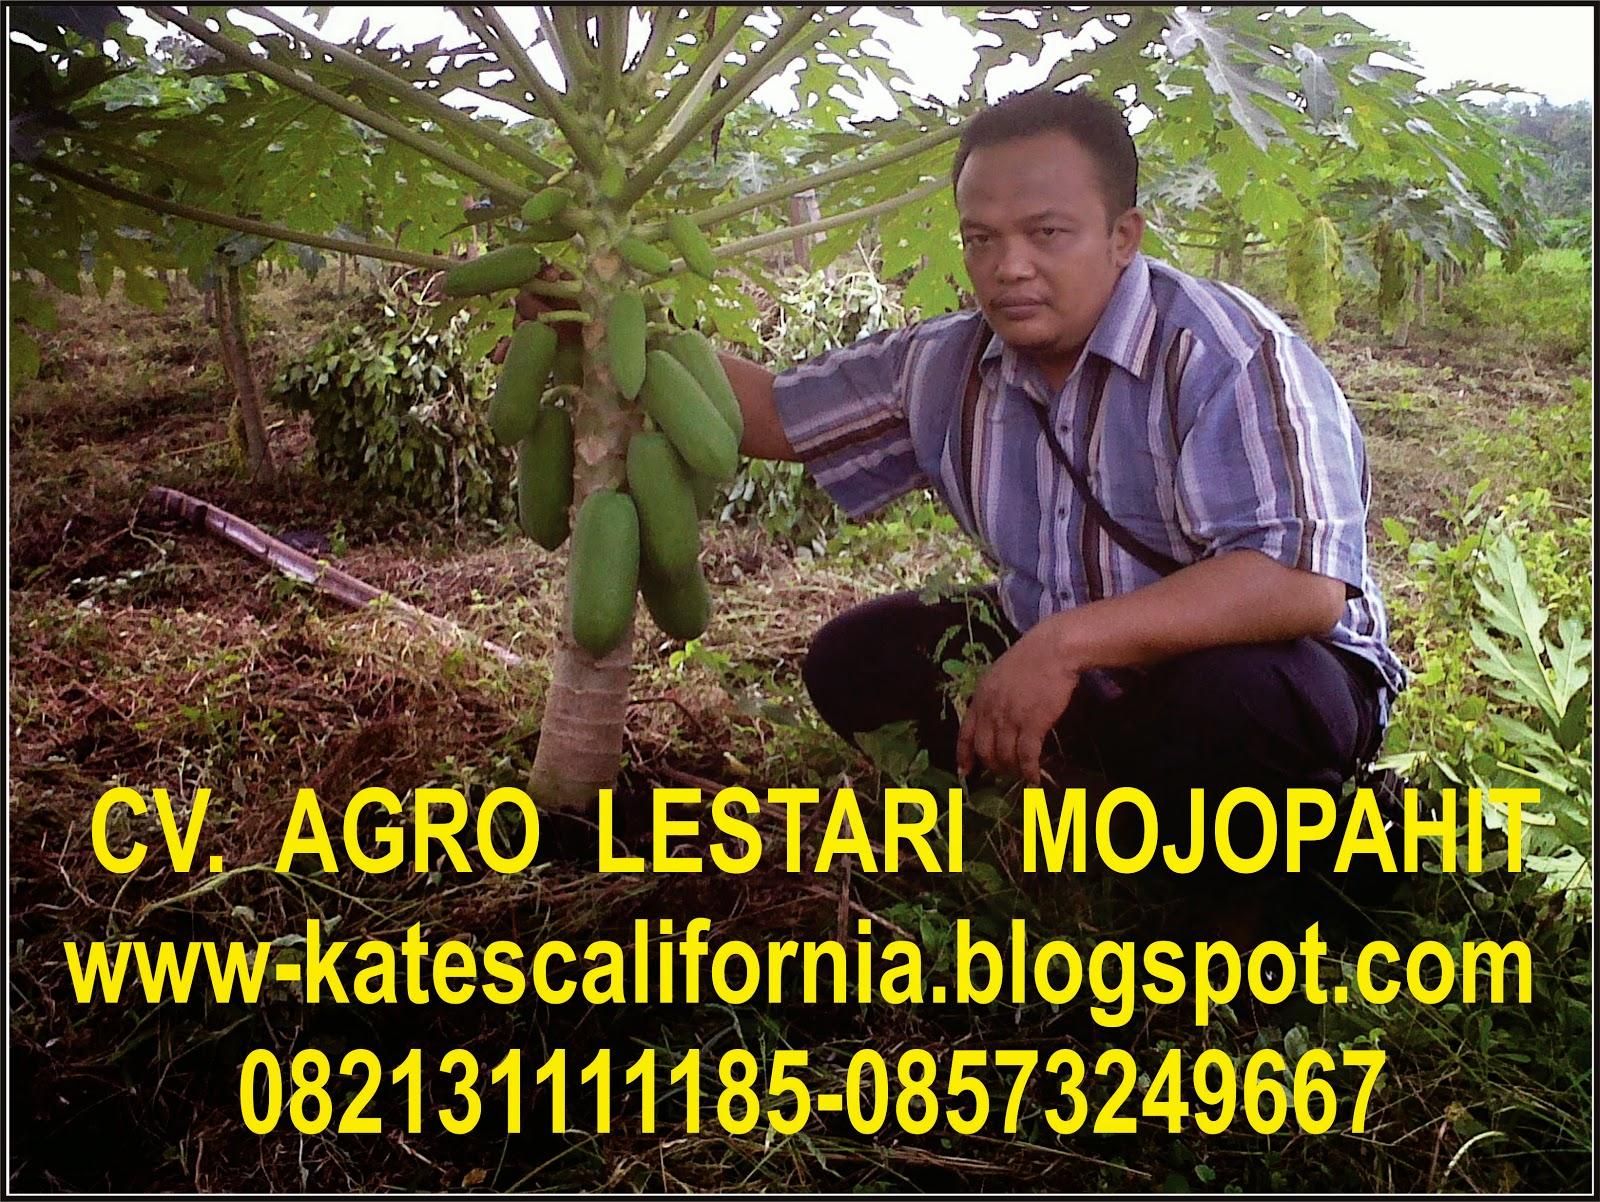 http://wwwlestarij4y4.blogspot.com/2008/07/konstruksi-baja.html